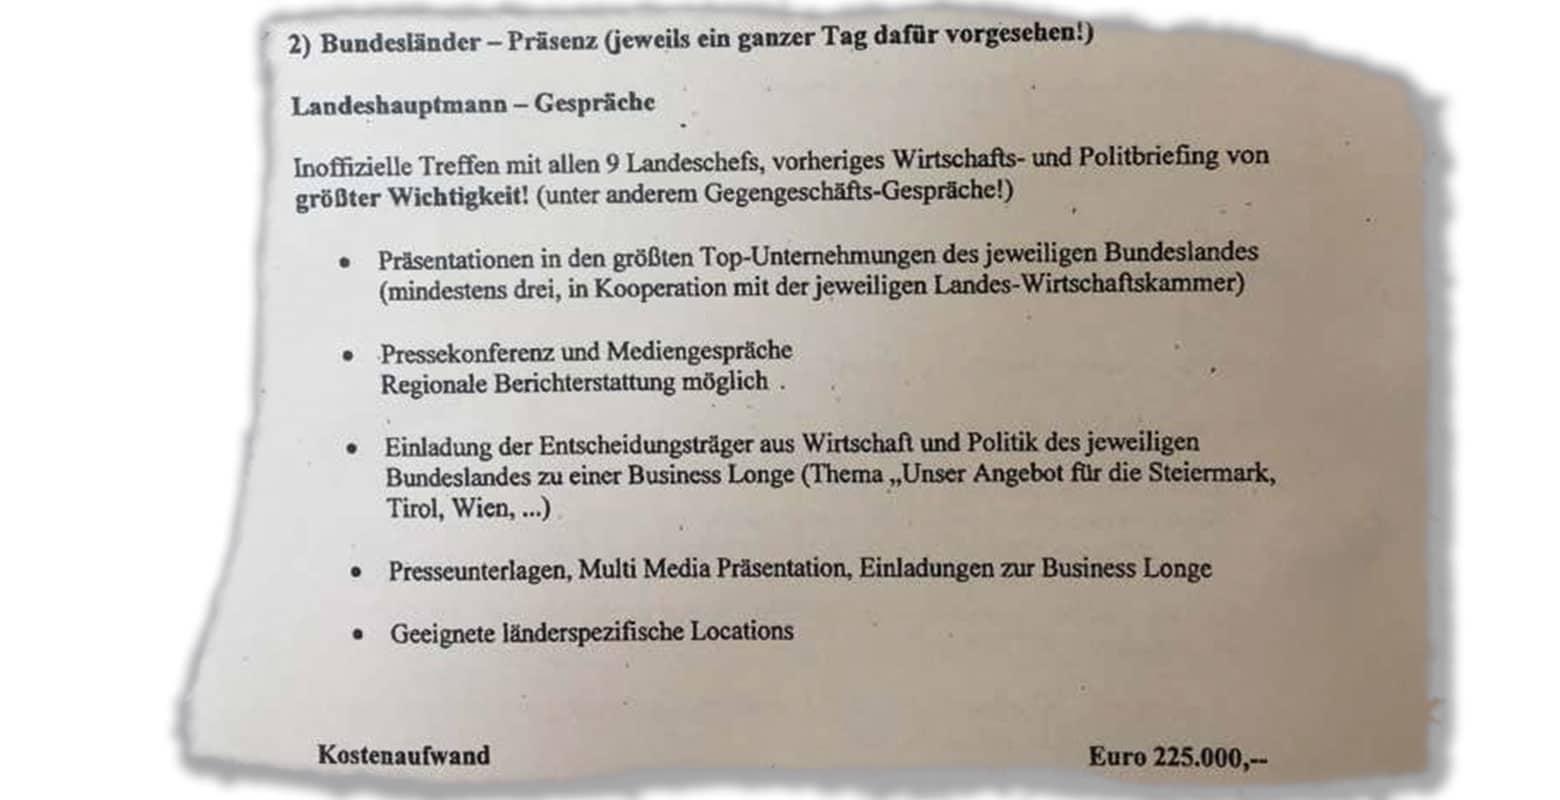 100 % Communications PR-Agentur-GmbH - Landeshauptmann Termine